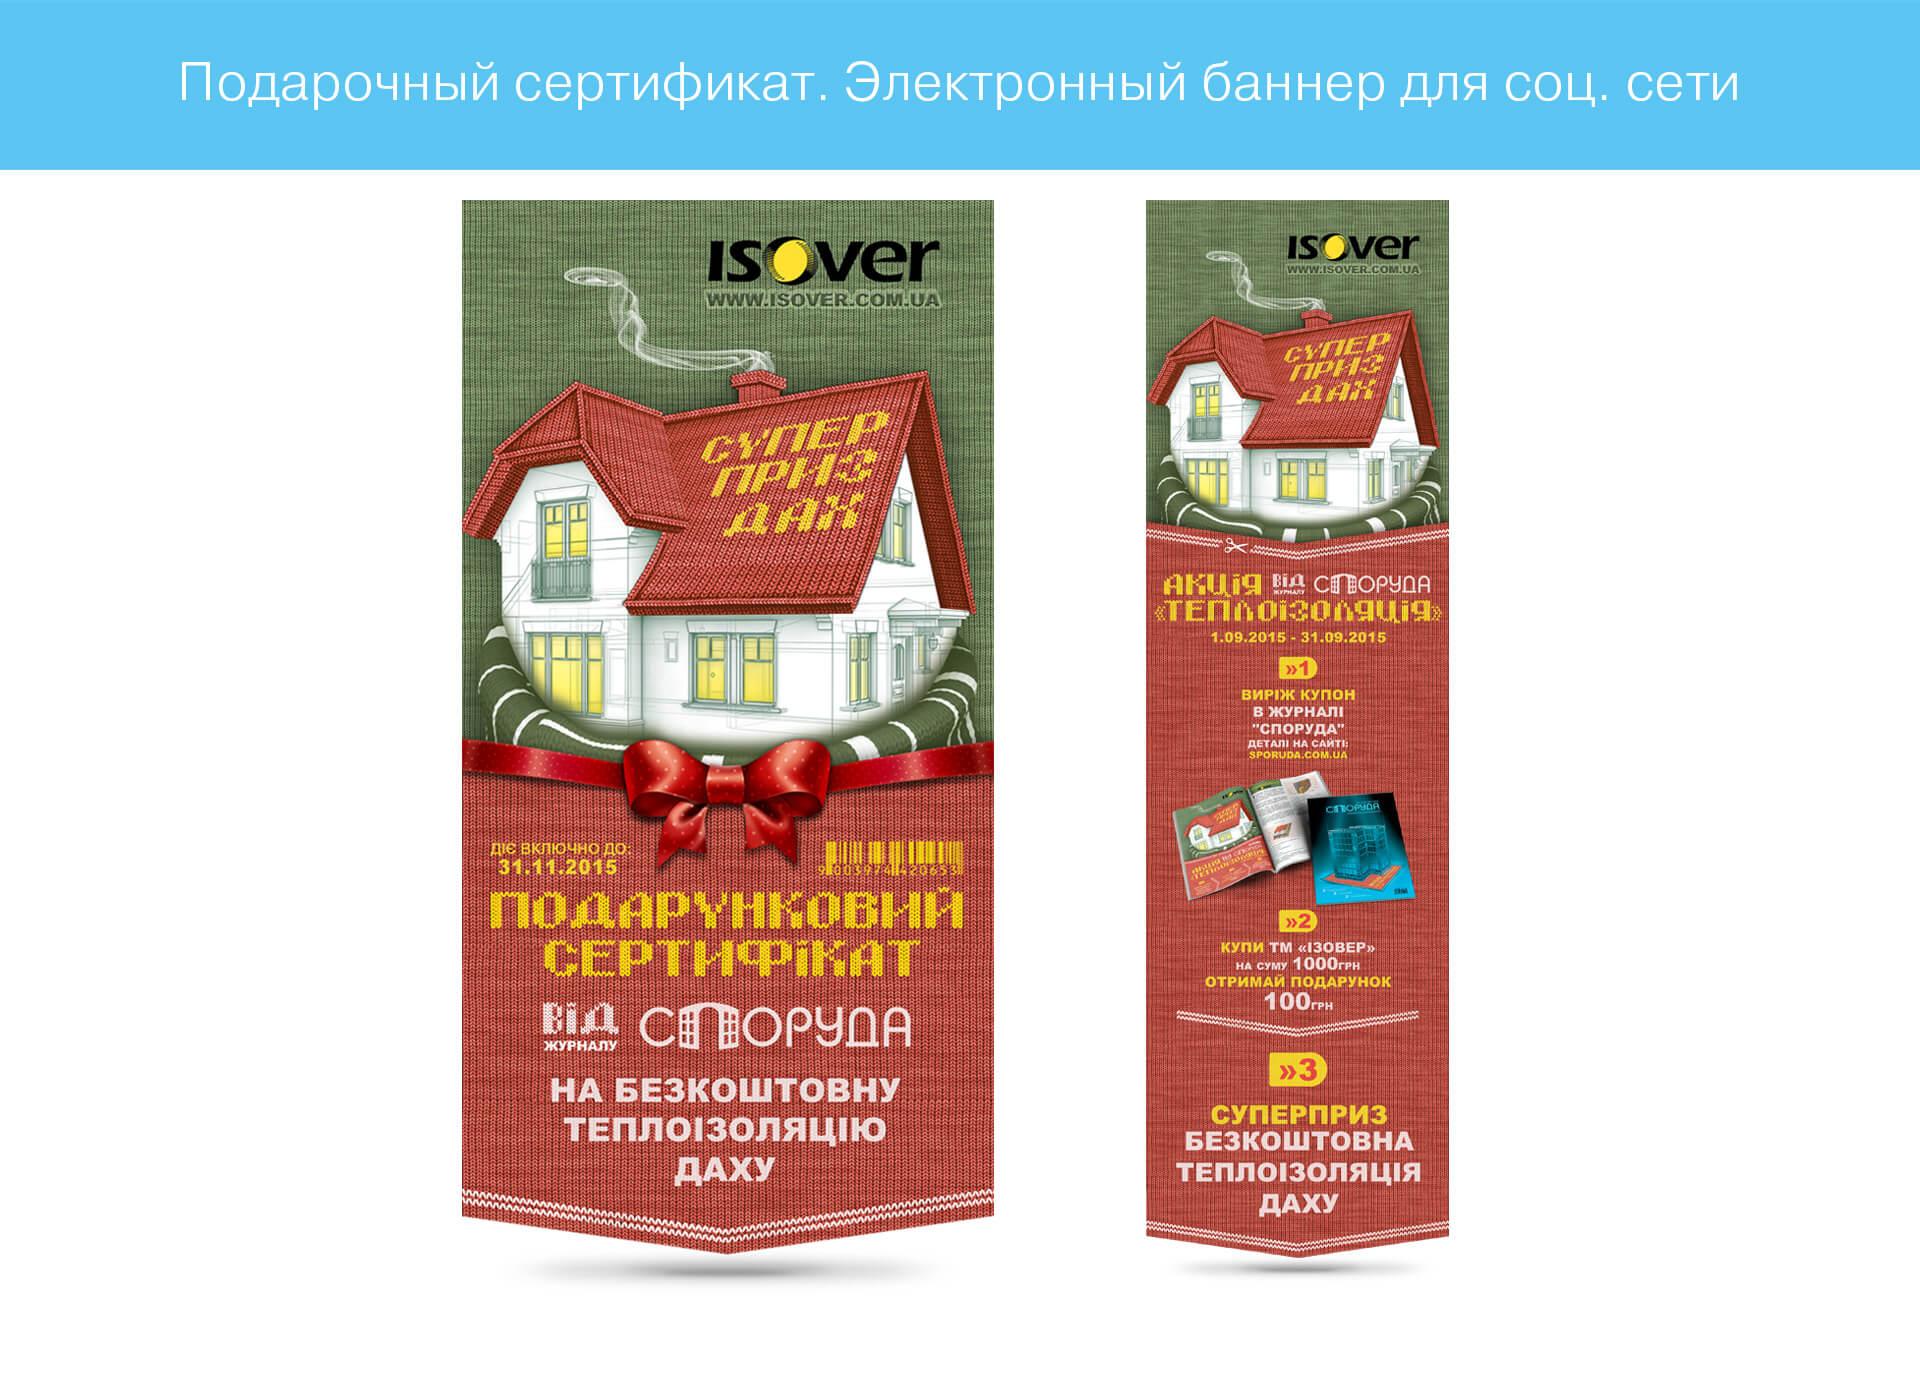 Prokochuk_Irina_architectural magazine Sporuda_аdvertising campaign_8